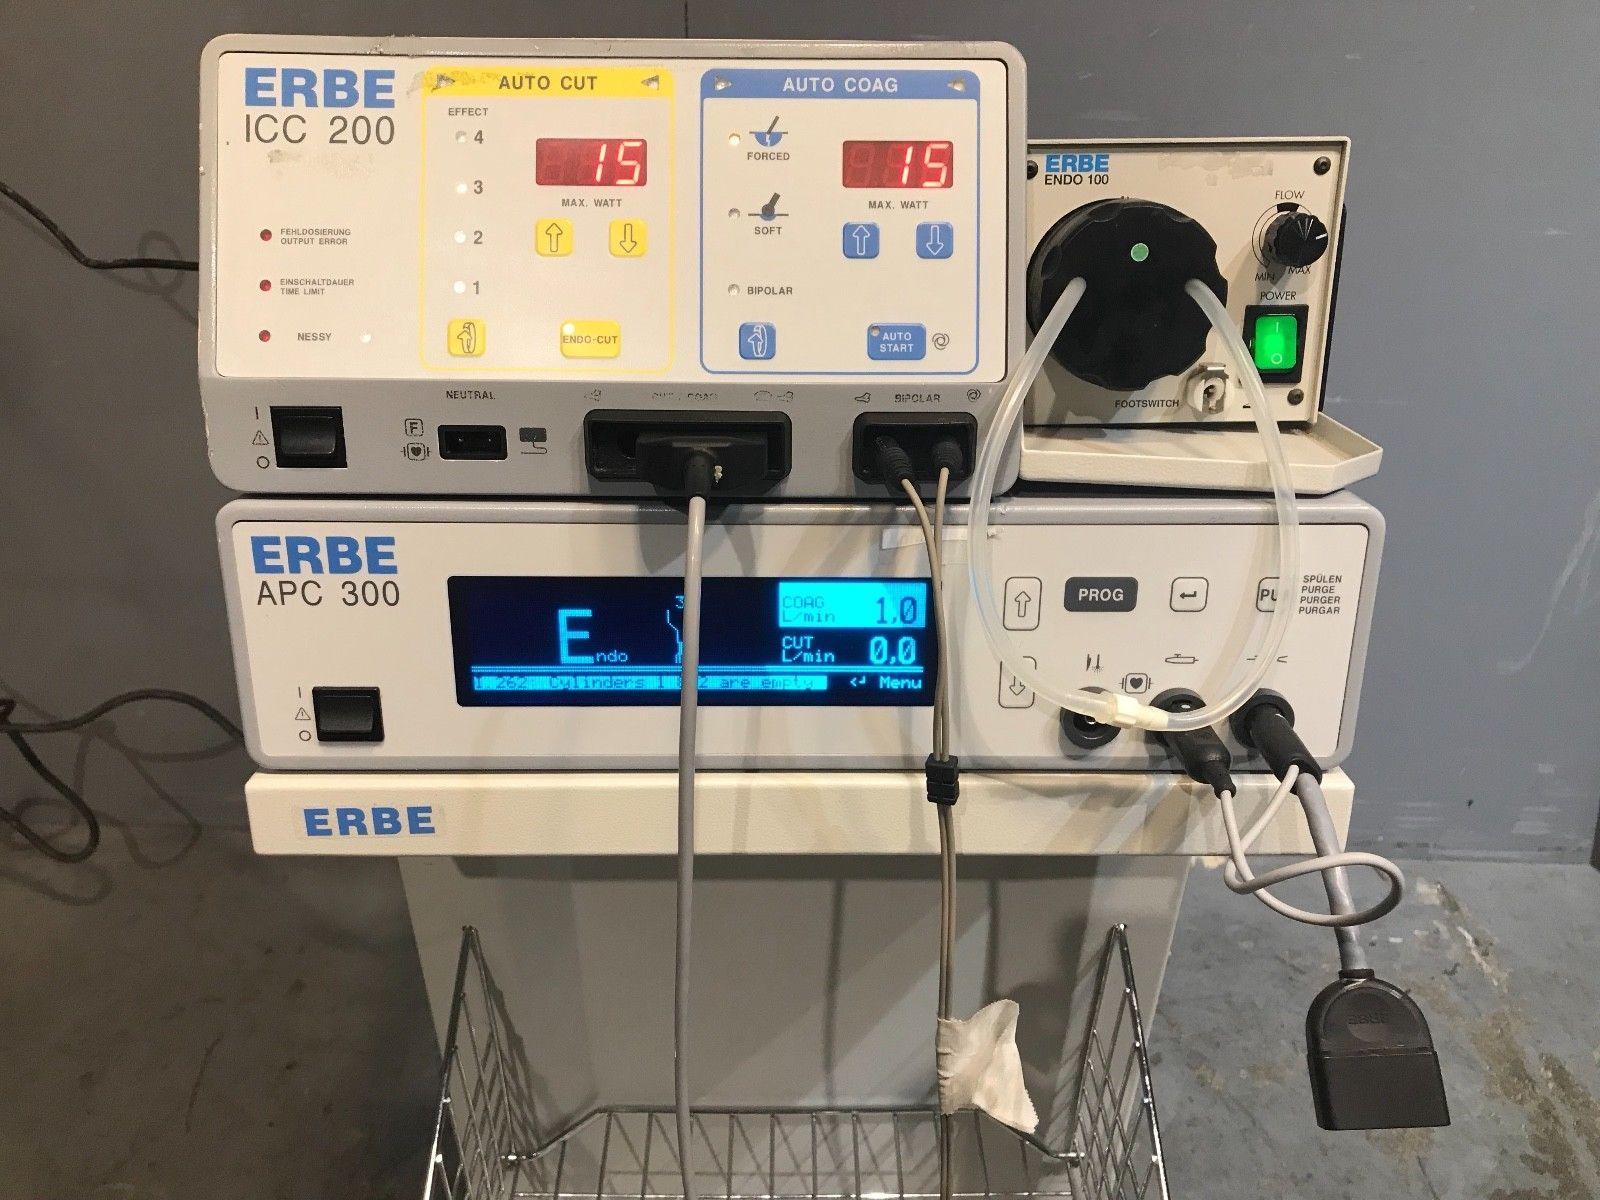 ERBE ICC 200 Electrosurgical Generator & APC 300 w/ENDO 100, Medical, Surgical